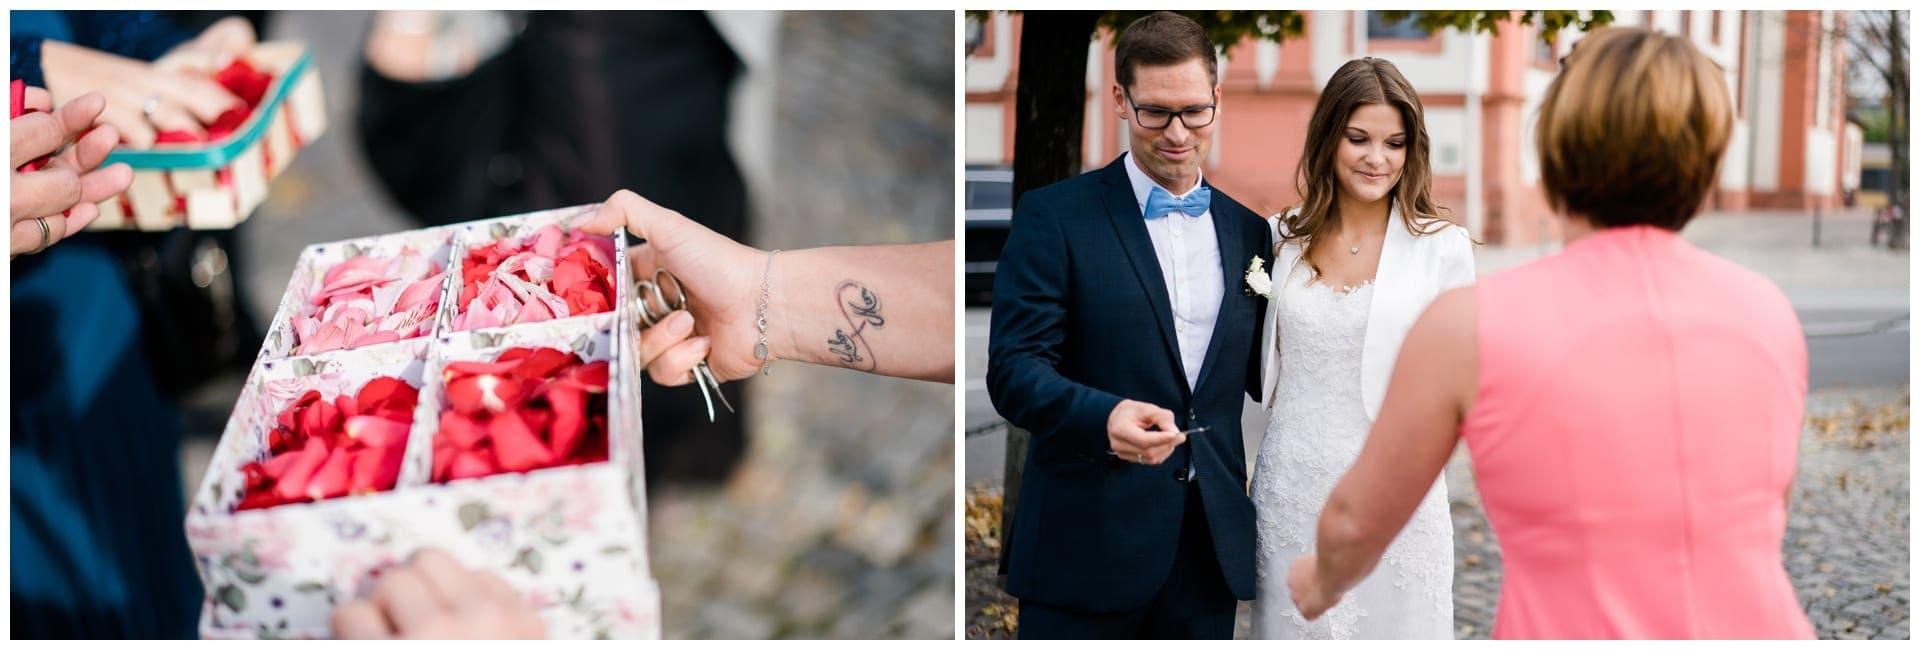 Caroline und Andreas @mama wedding 34